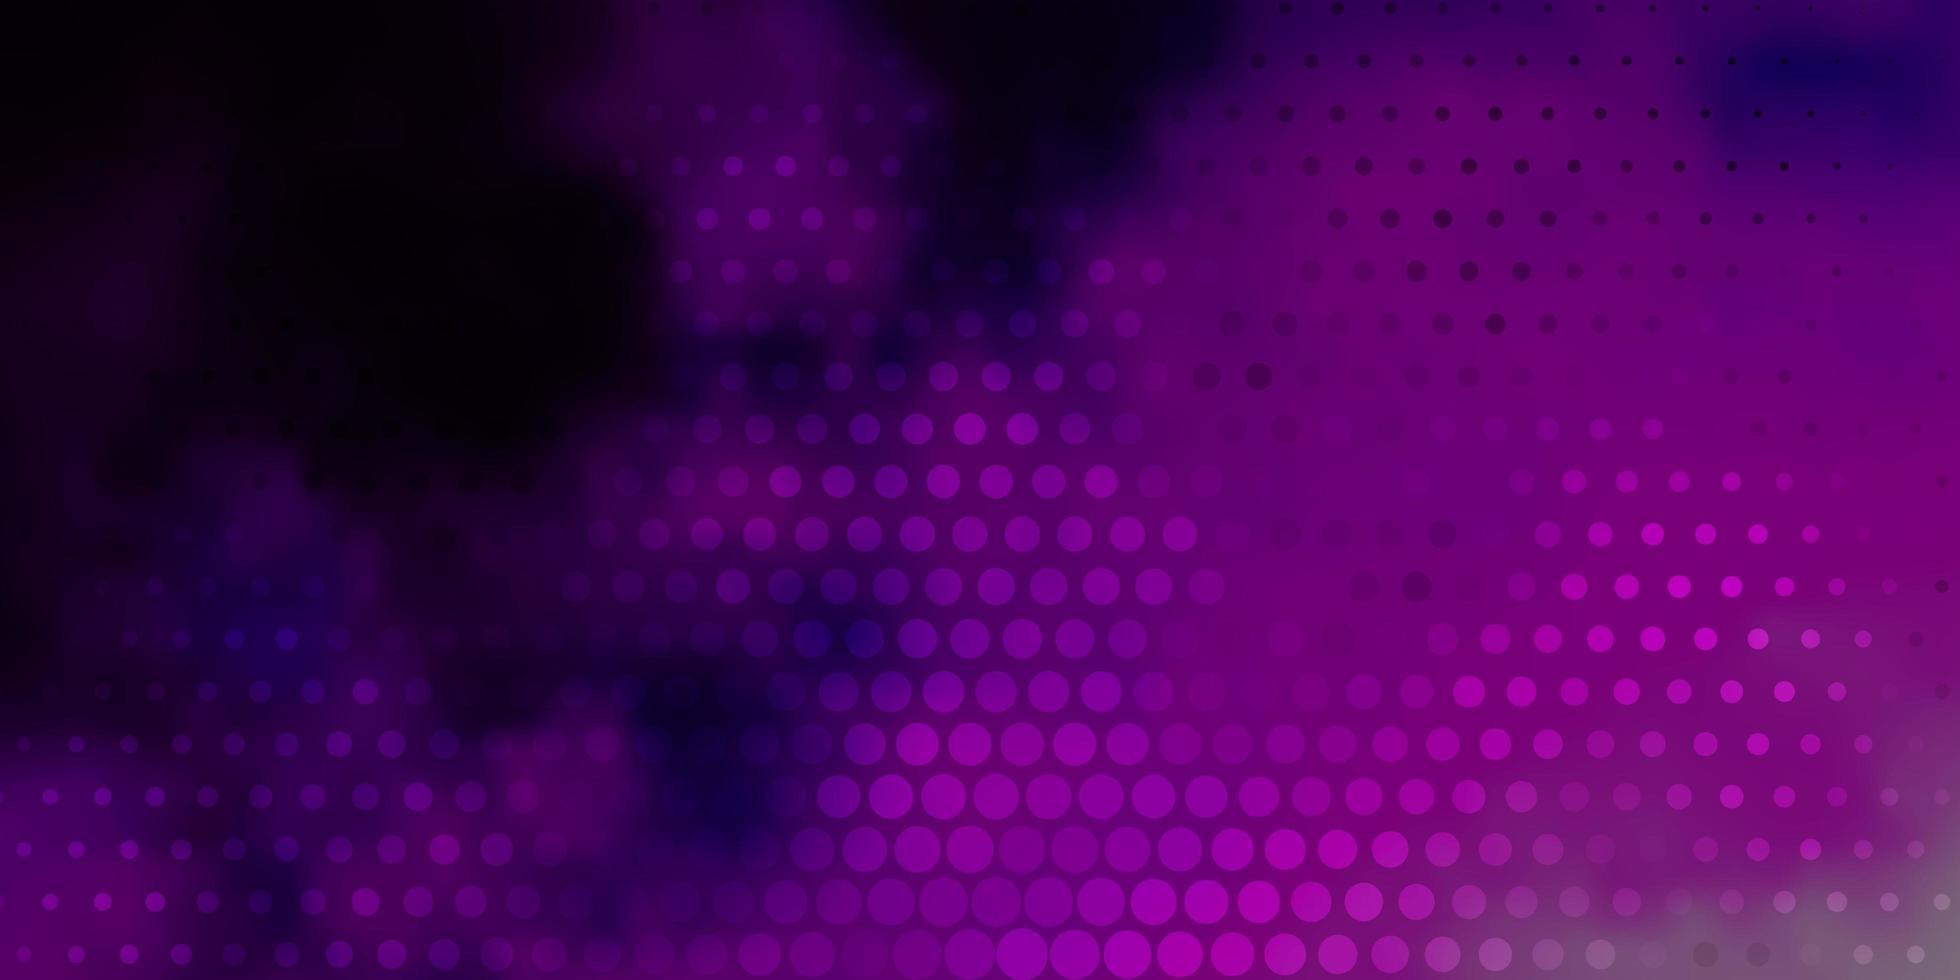 ljusrosa vektor konsistens med skivor.